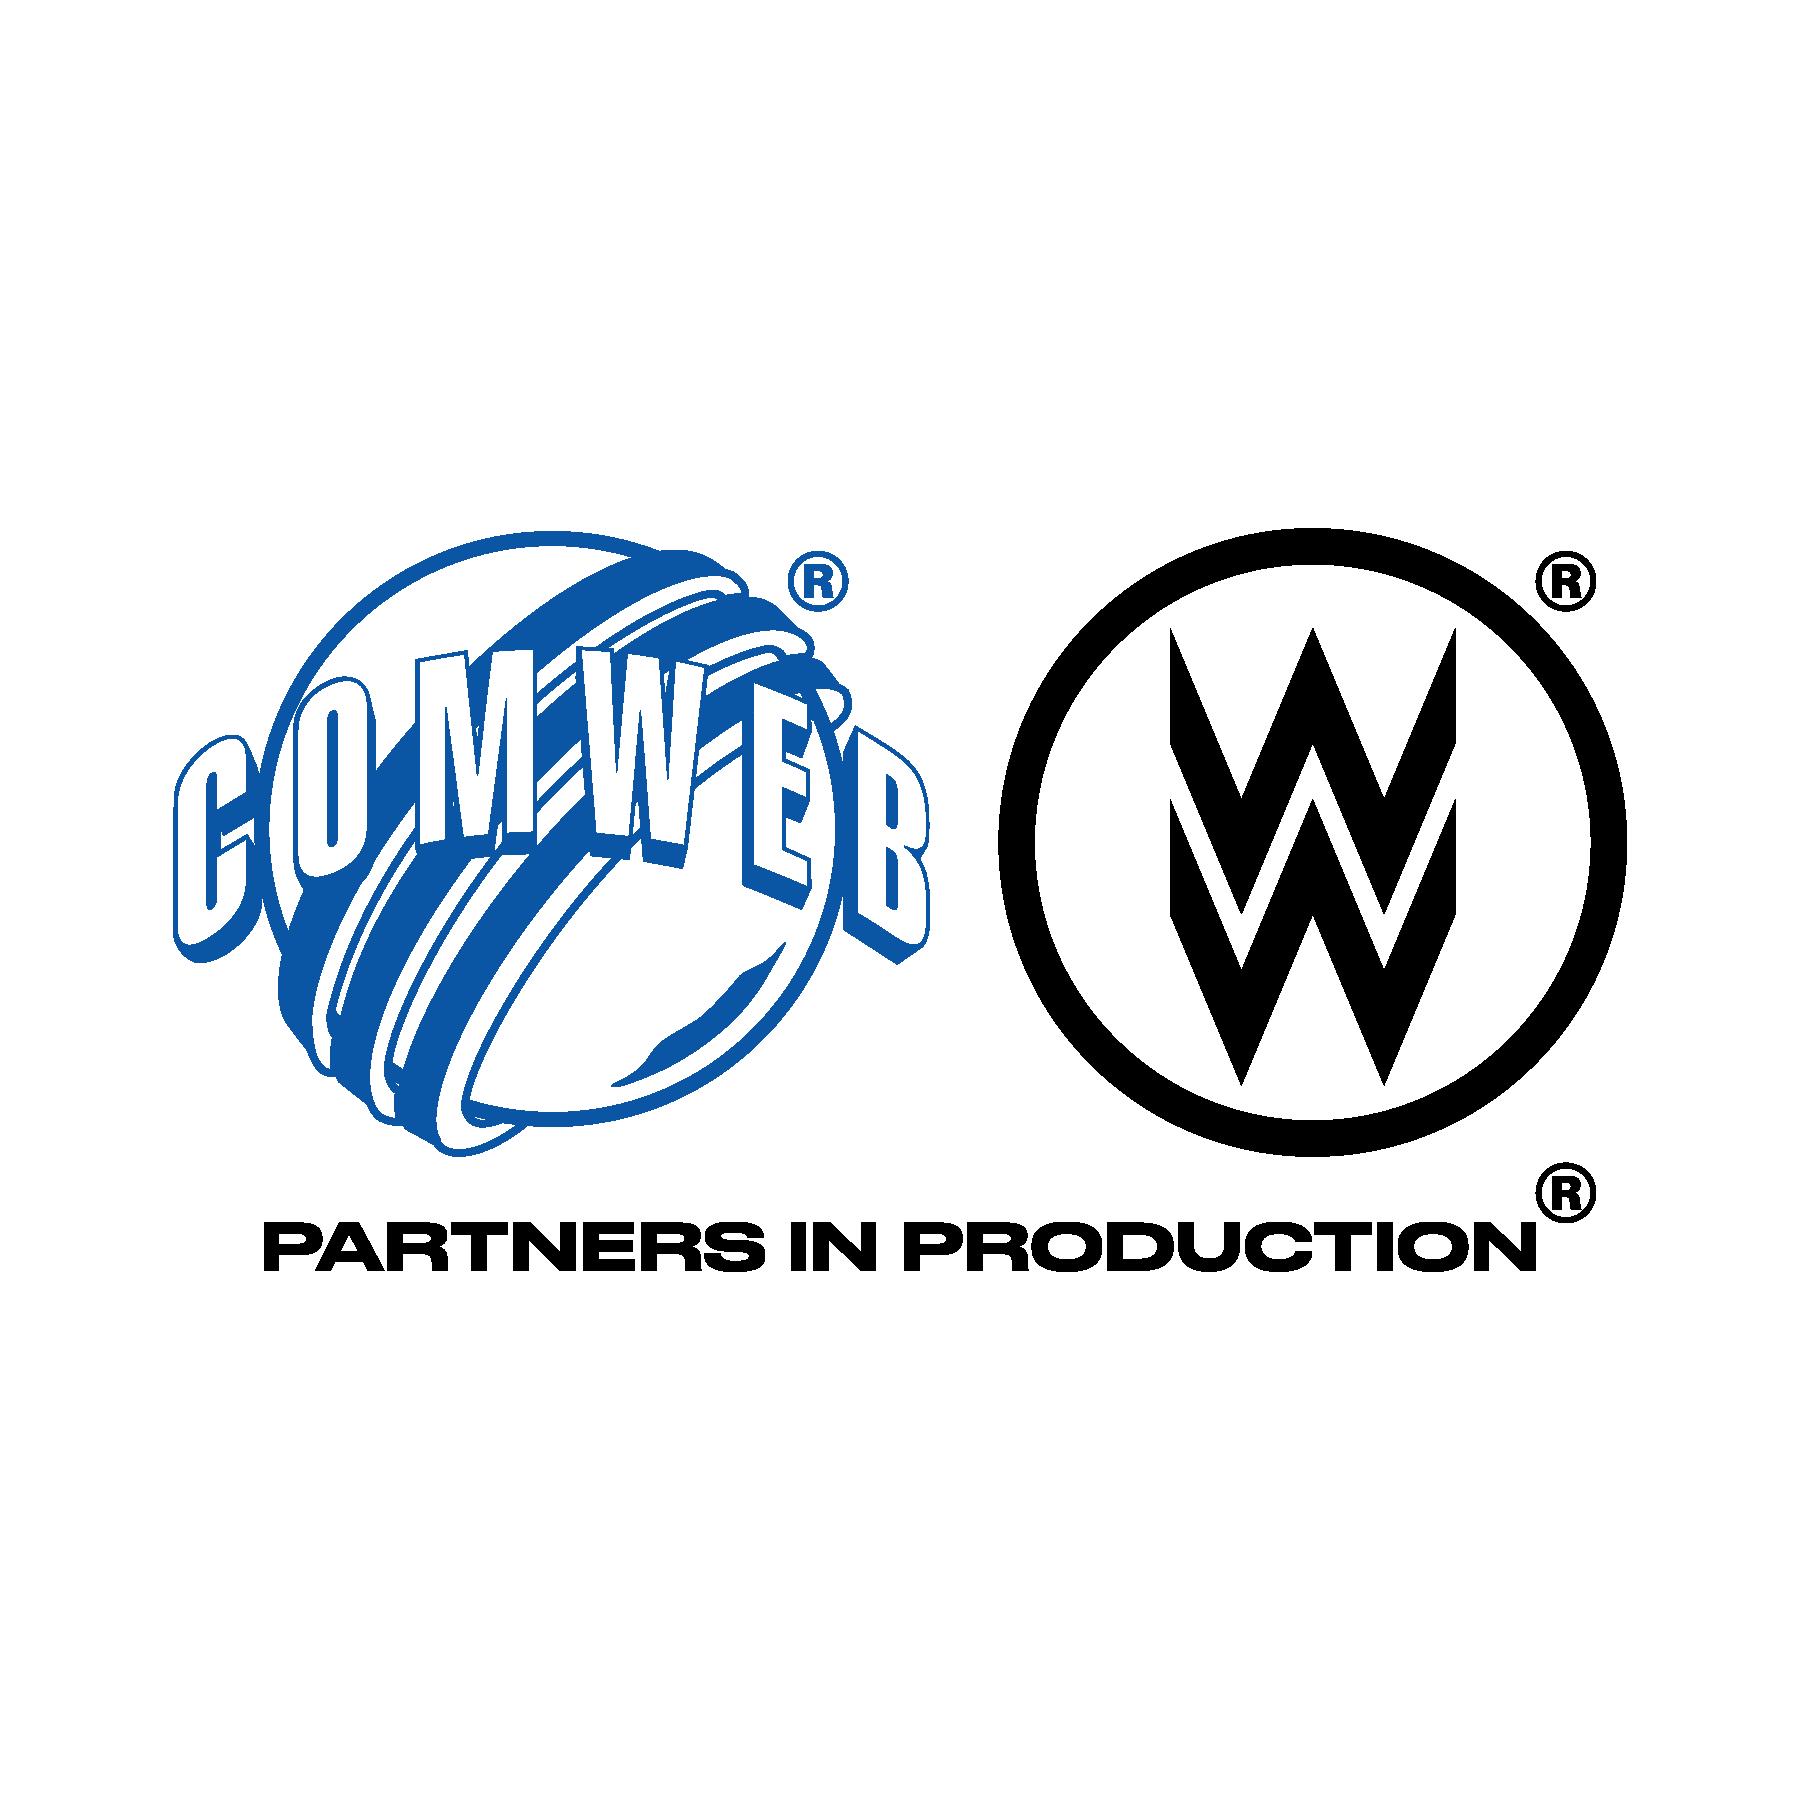 COMWEB-WW-PIP-01.png